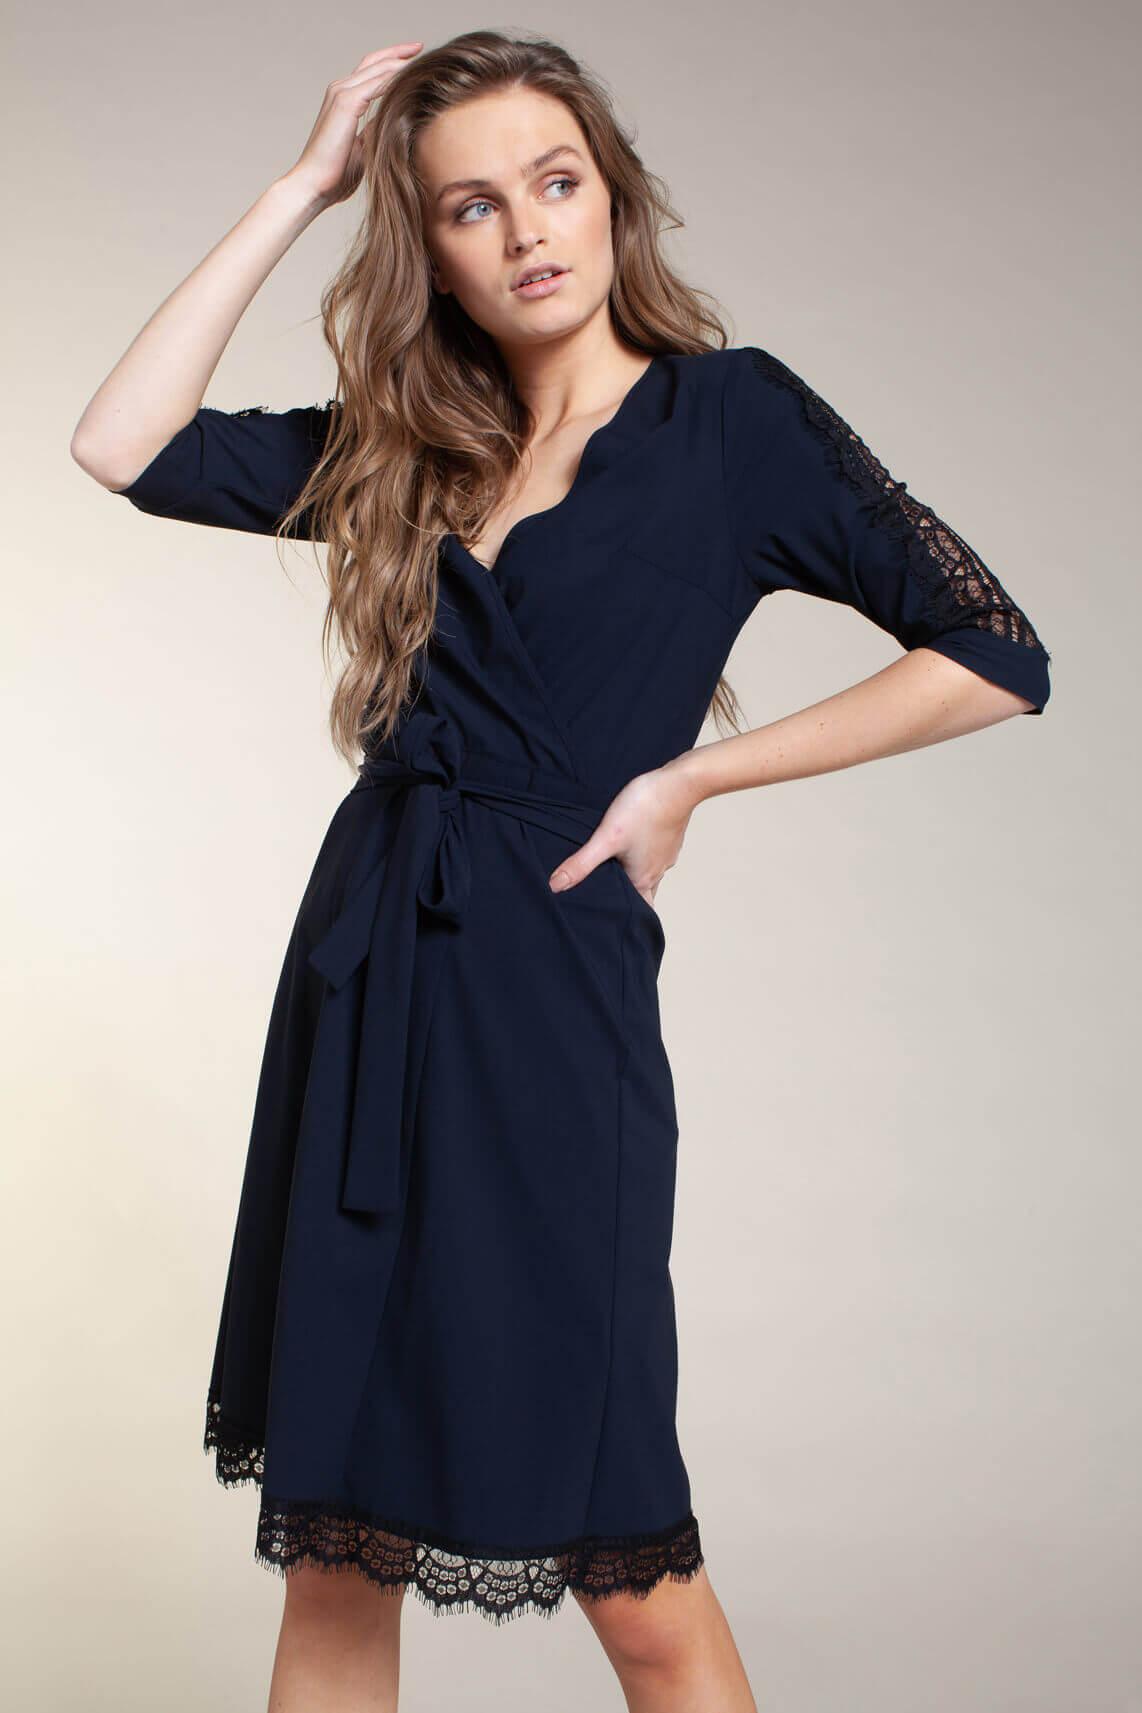 Jane Lushka Dames Staci wrap jurk Blauw